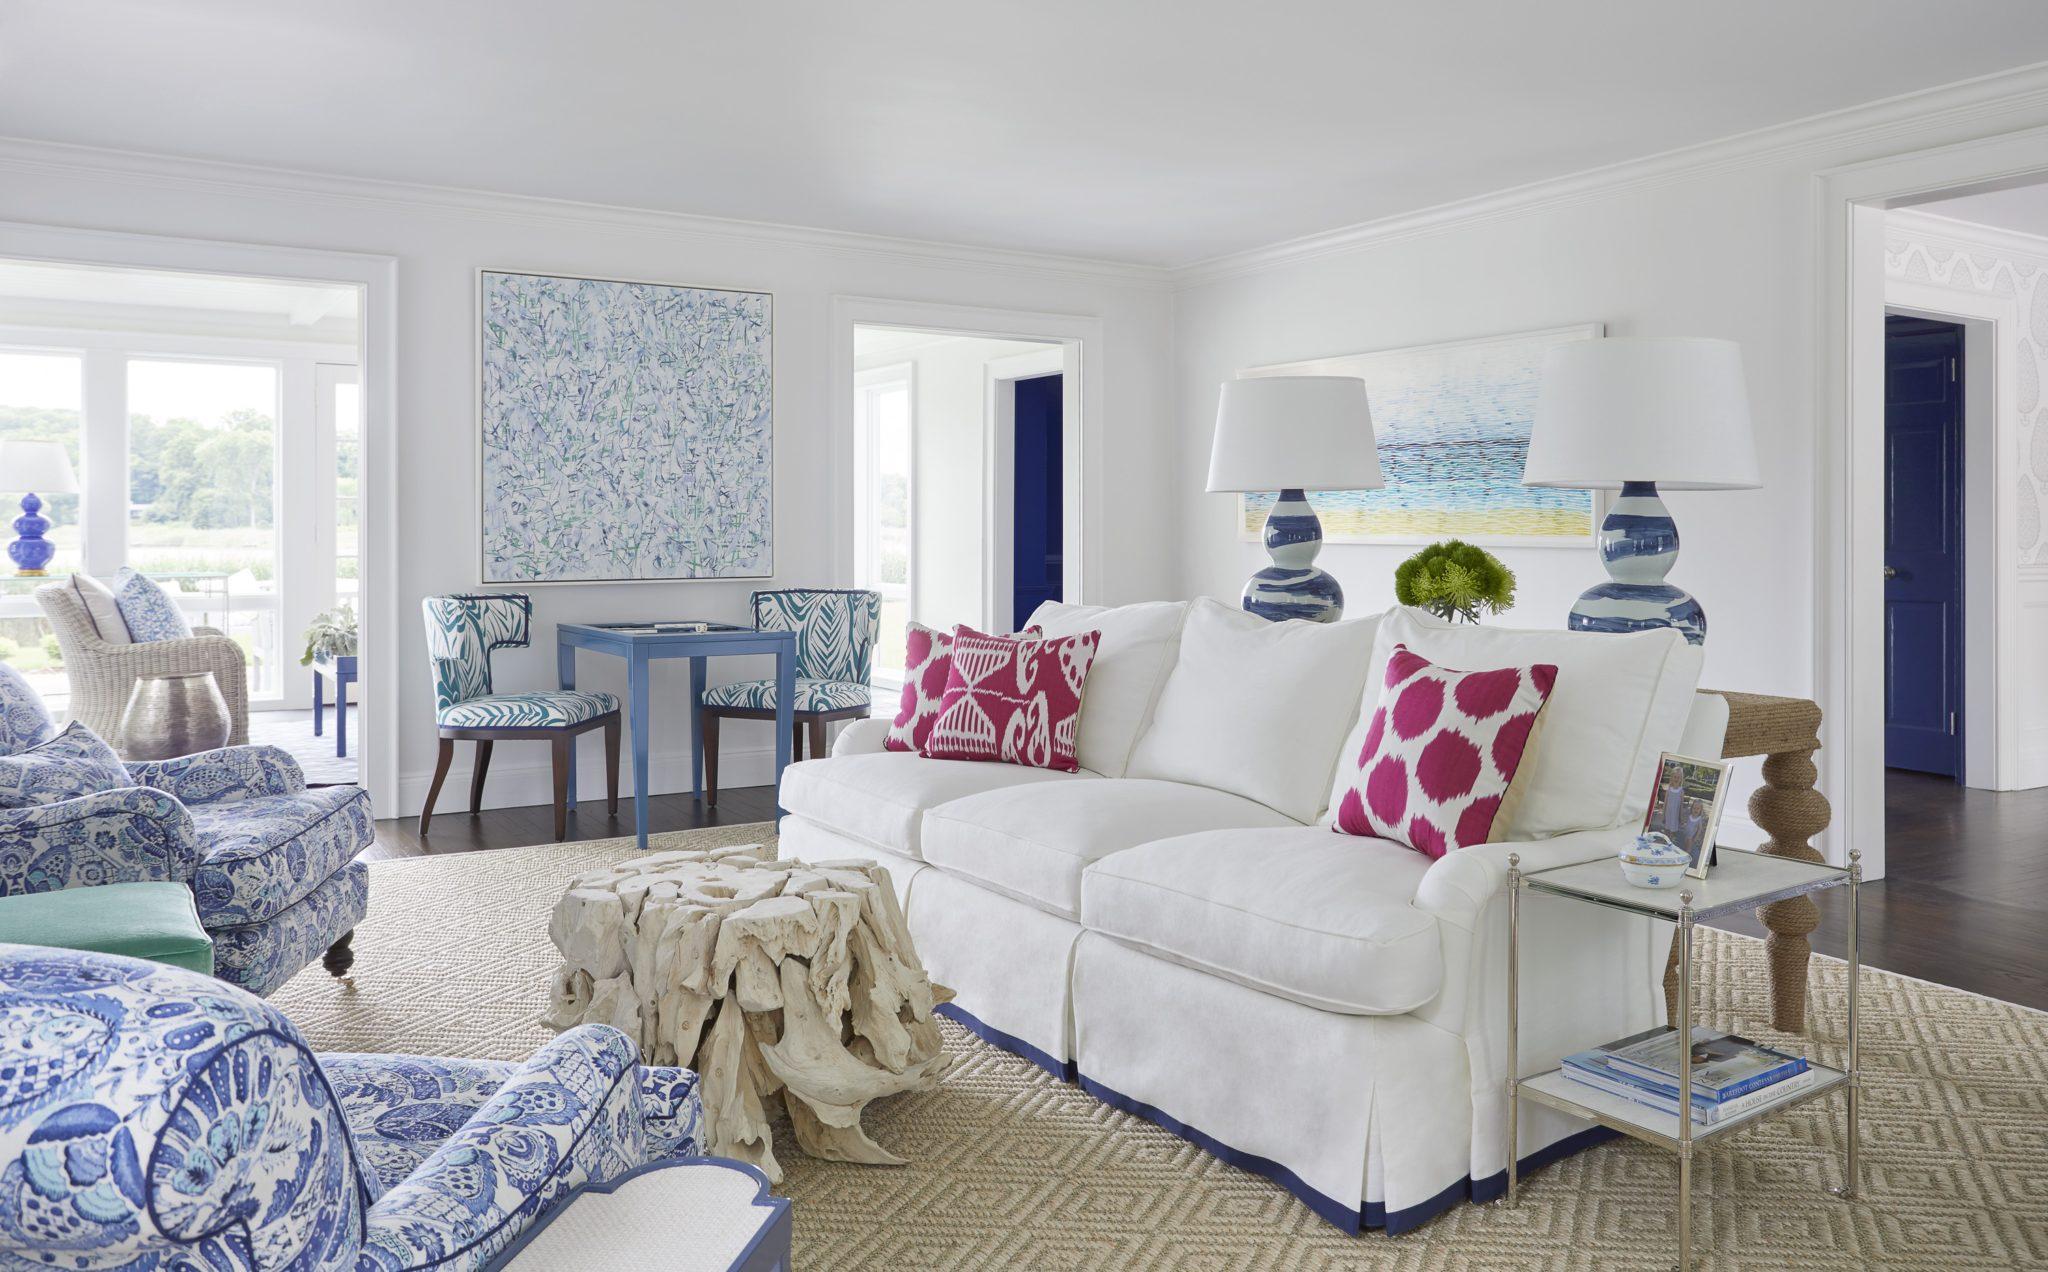 Mimi McAndrew: Living Room; Long Island Summer House by Mimi McAndrew LLC